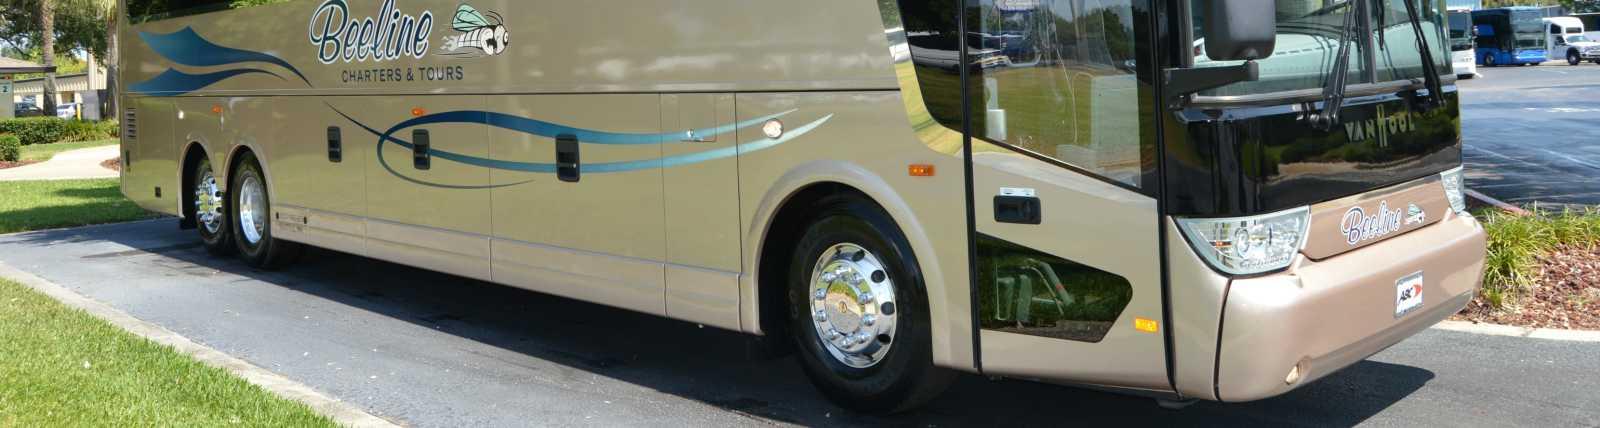 Beeline 56 Passenger Coach